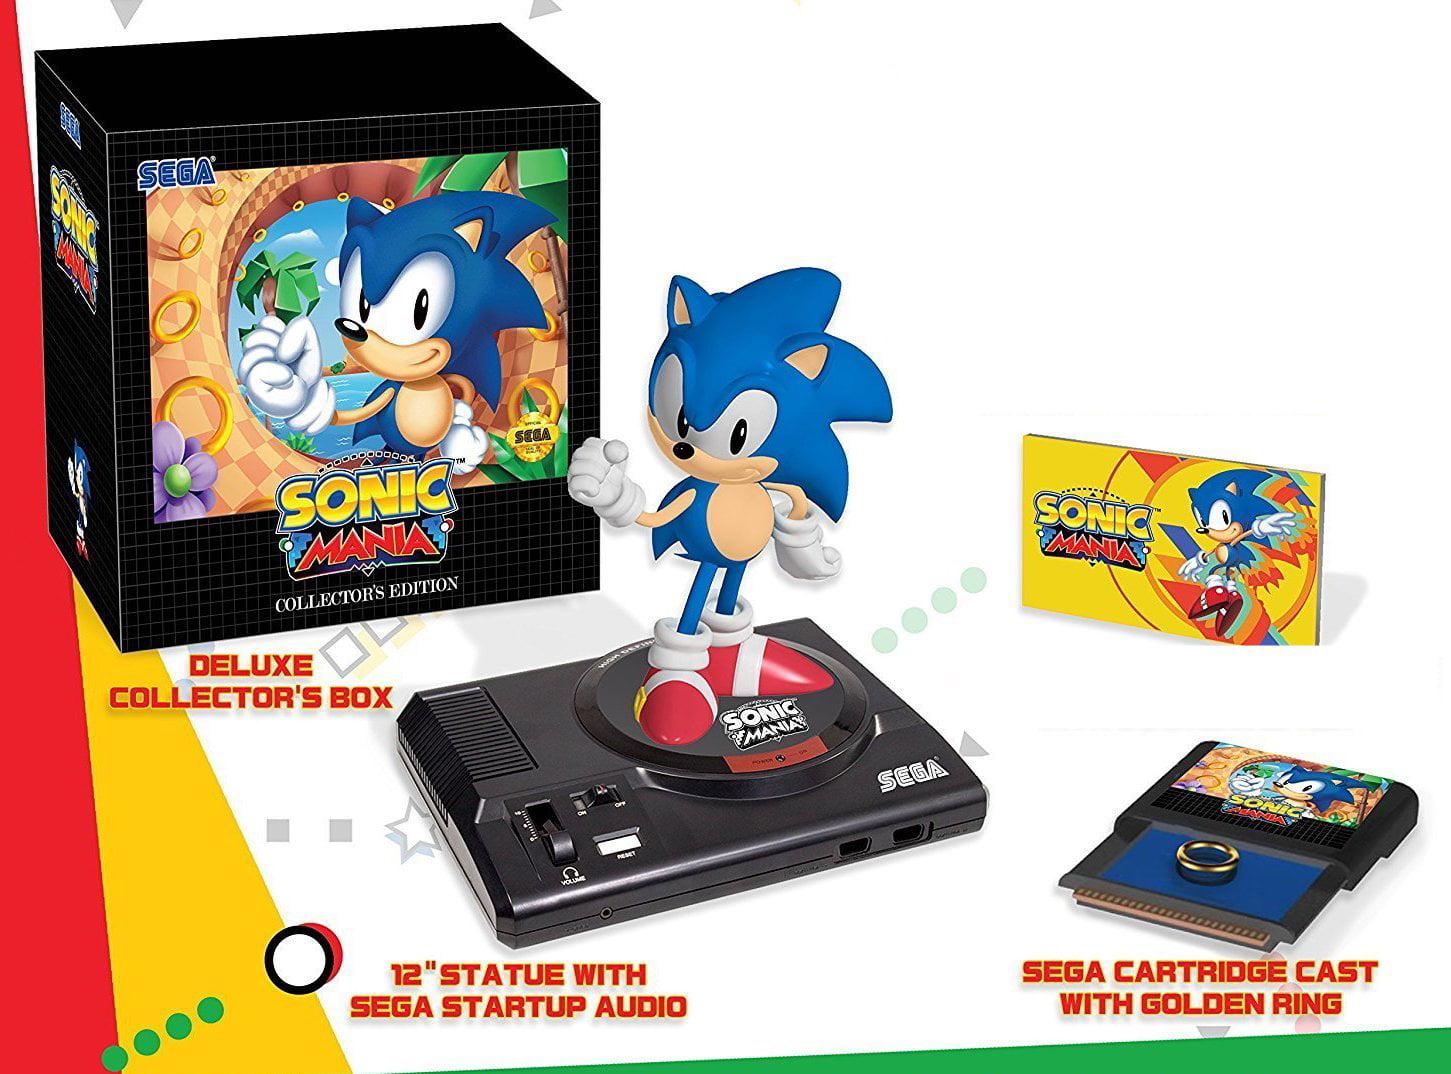 Refurbished Sega Sonic Mania Collectors Edition (Playstation 4) by Sega